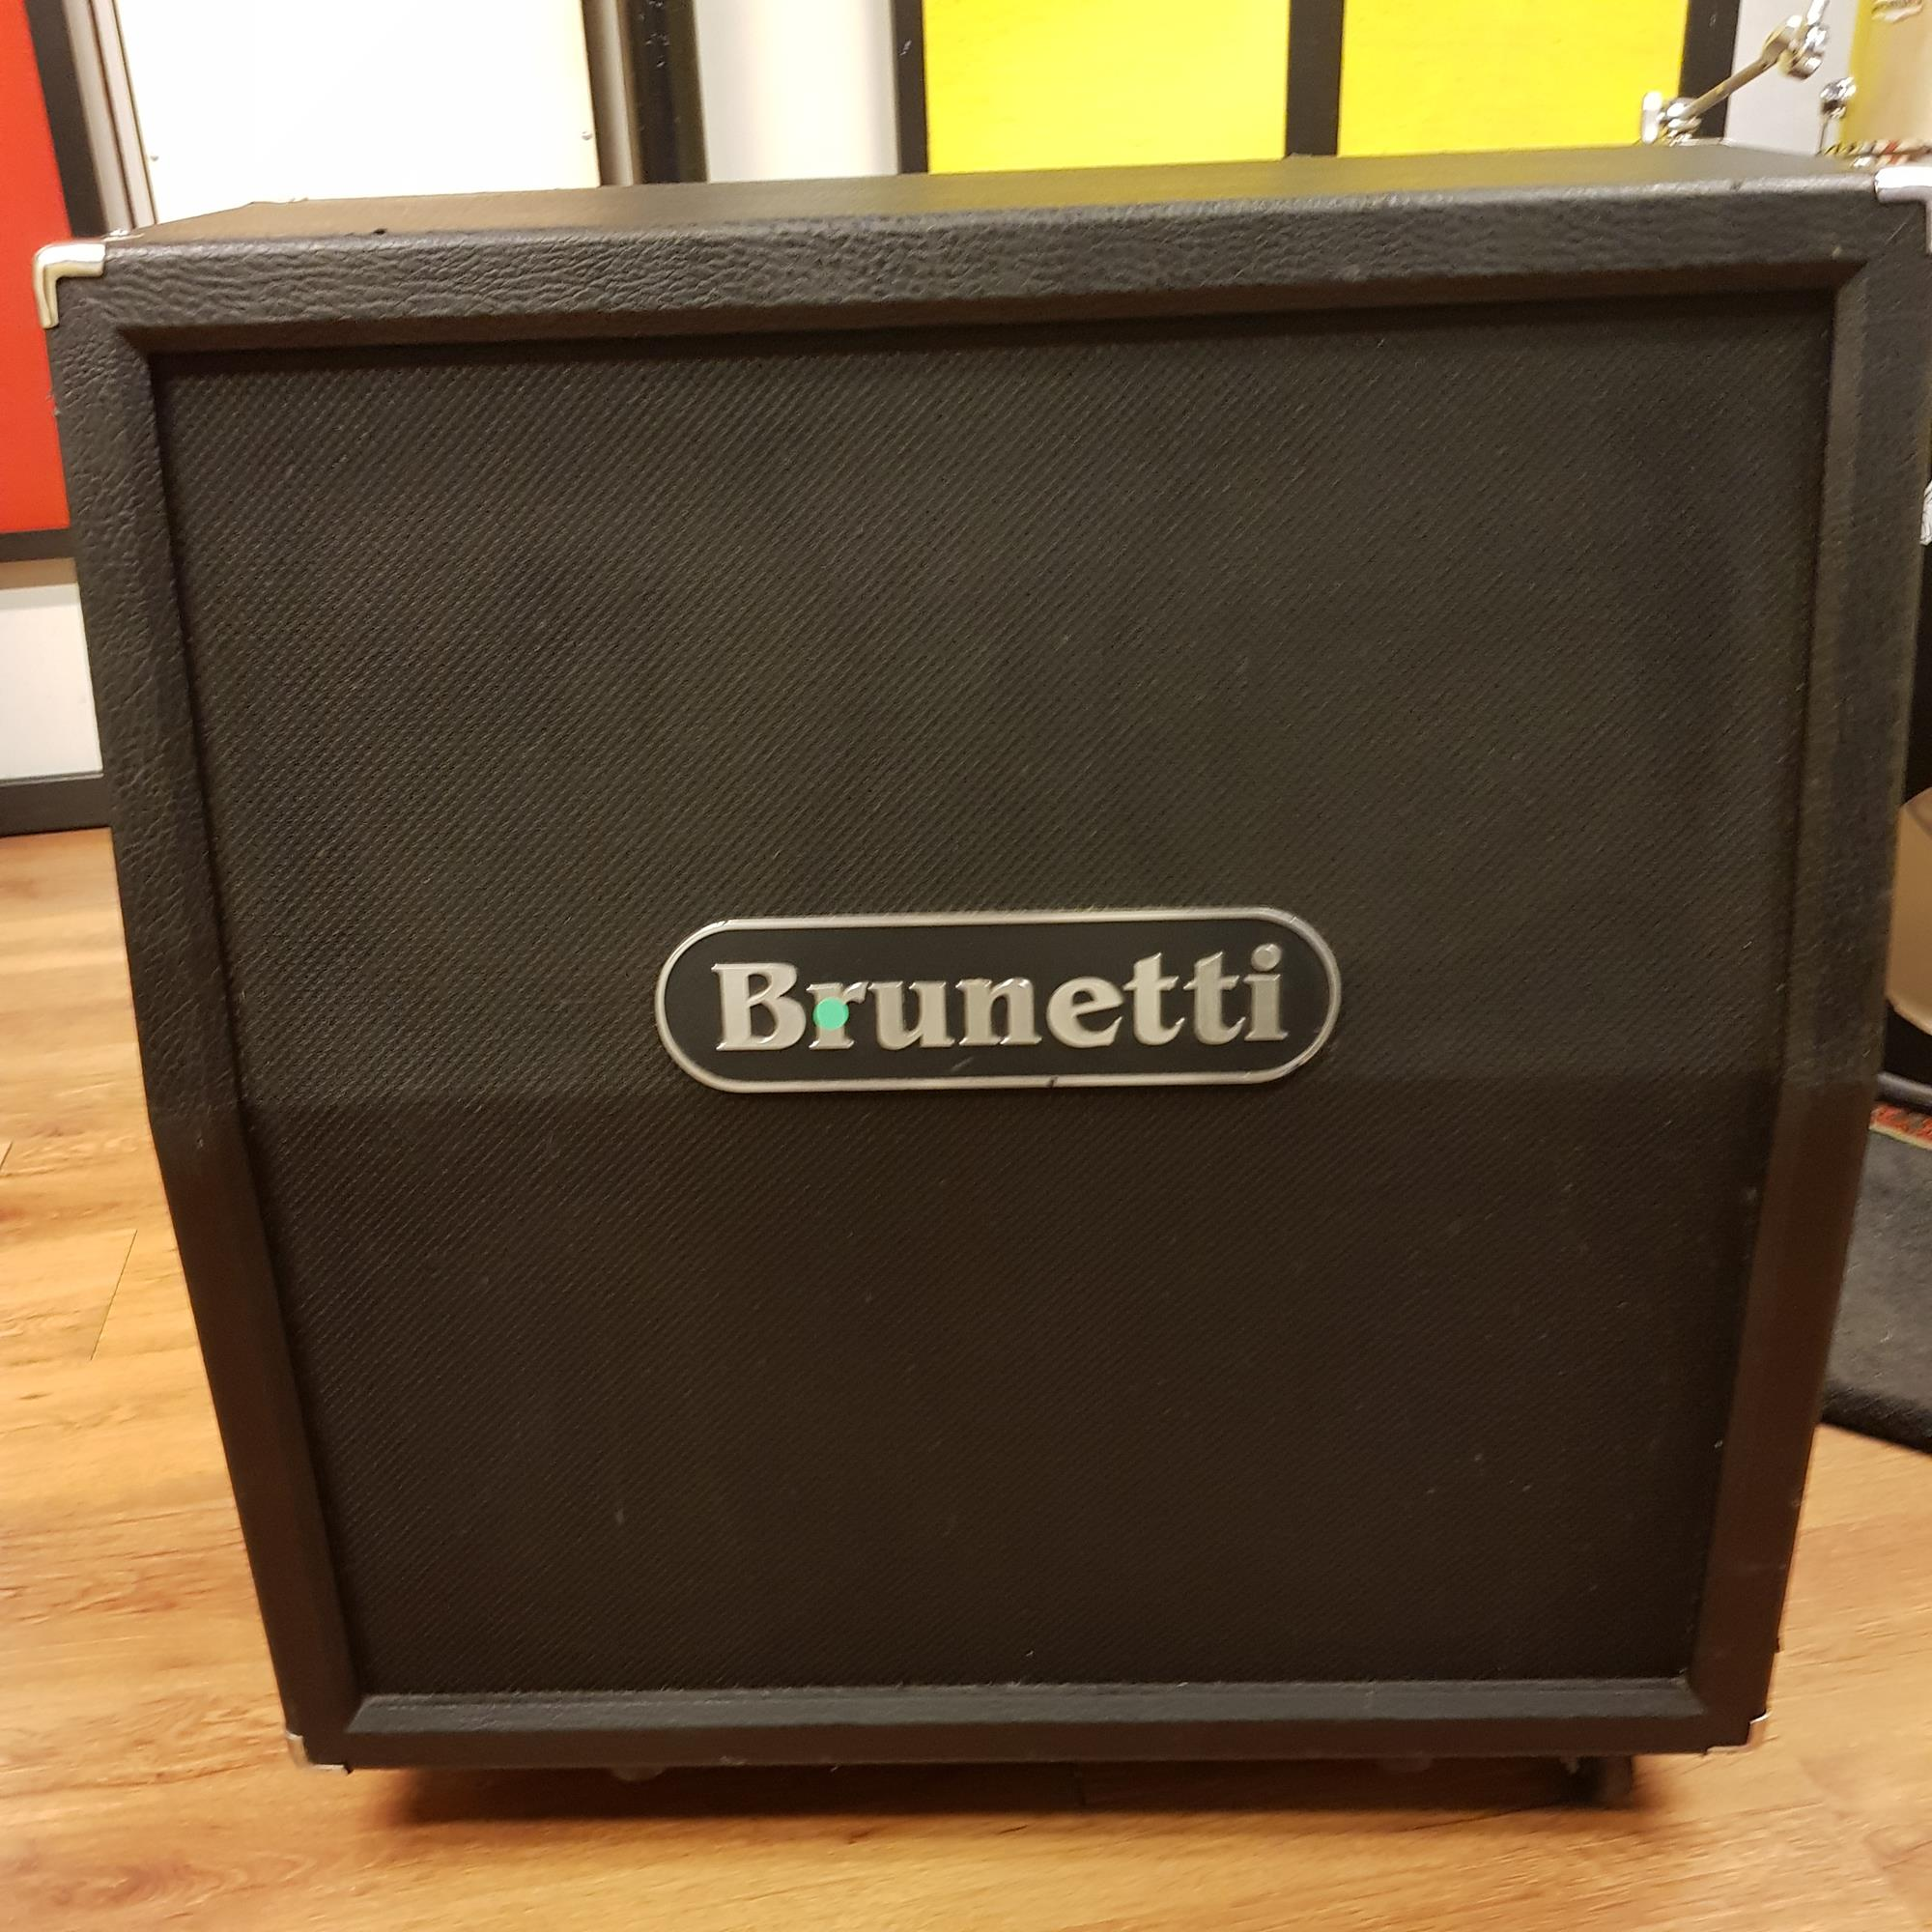 BRUNETTI-4X12-XL-412-CAB-CABINET-sku-1602871402218